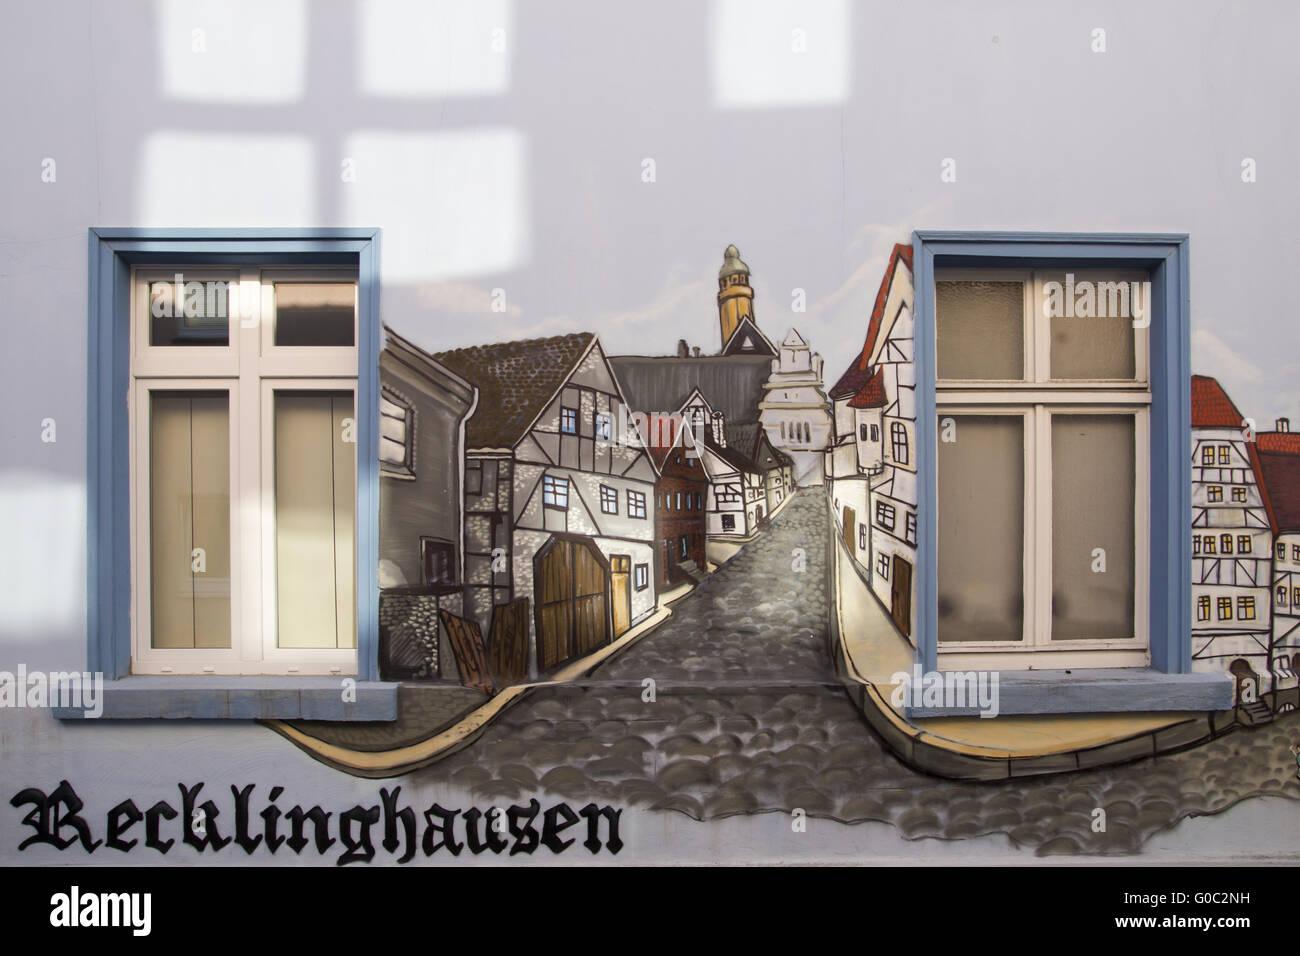 Mural in the inner city in Recklinghausen, Germany - Stock Image